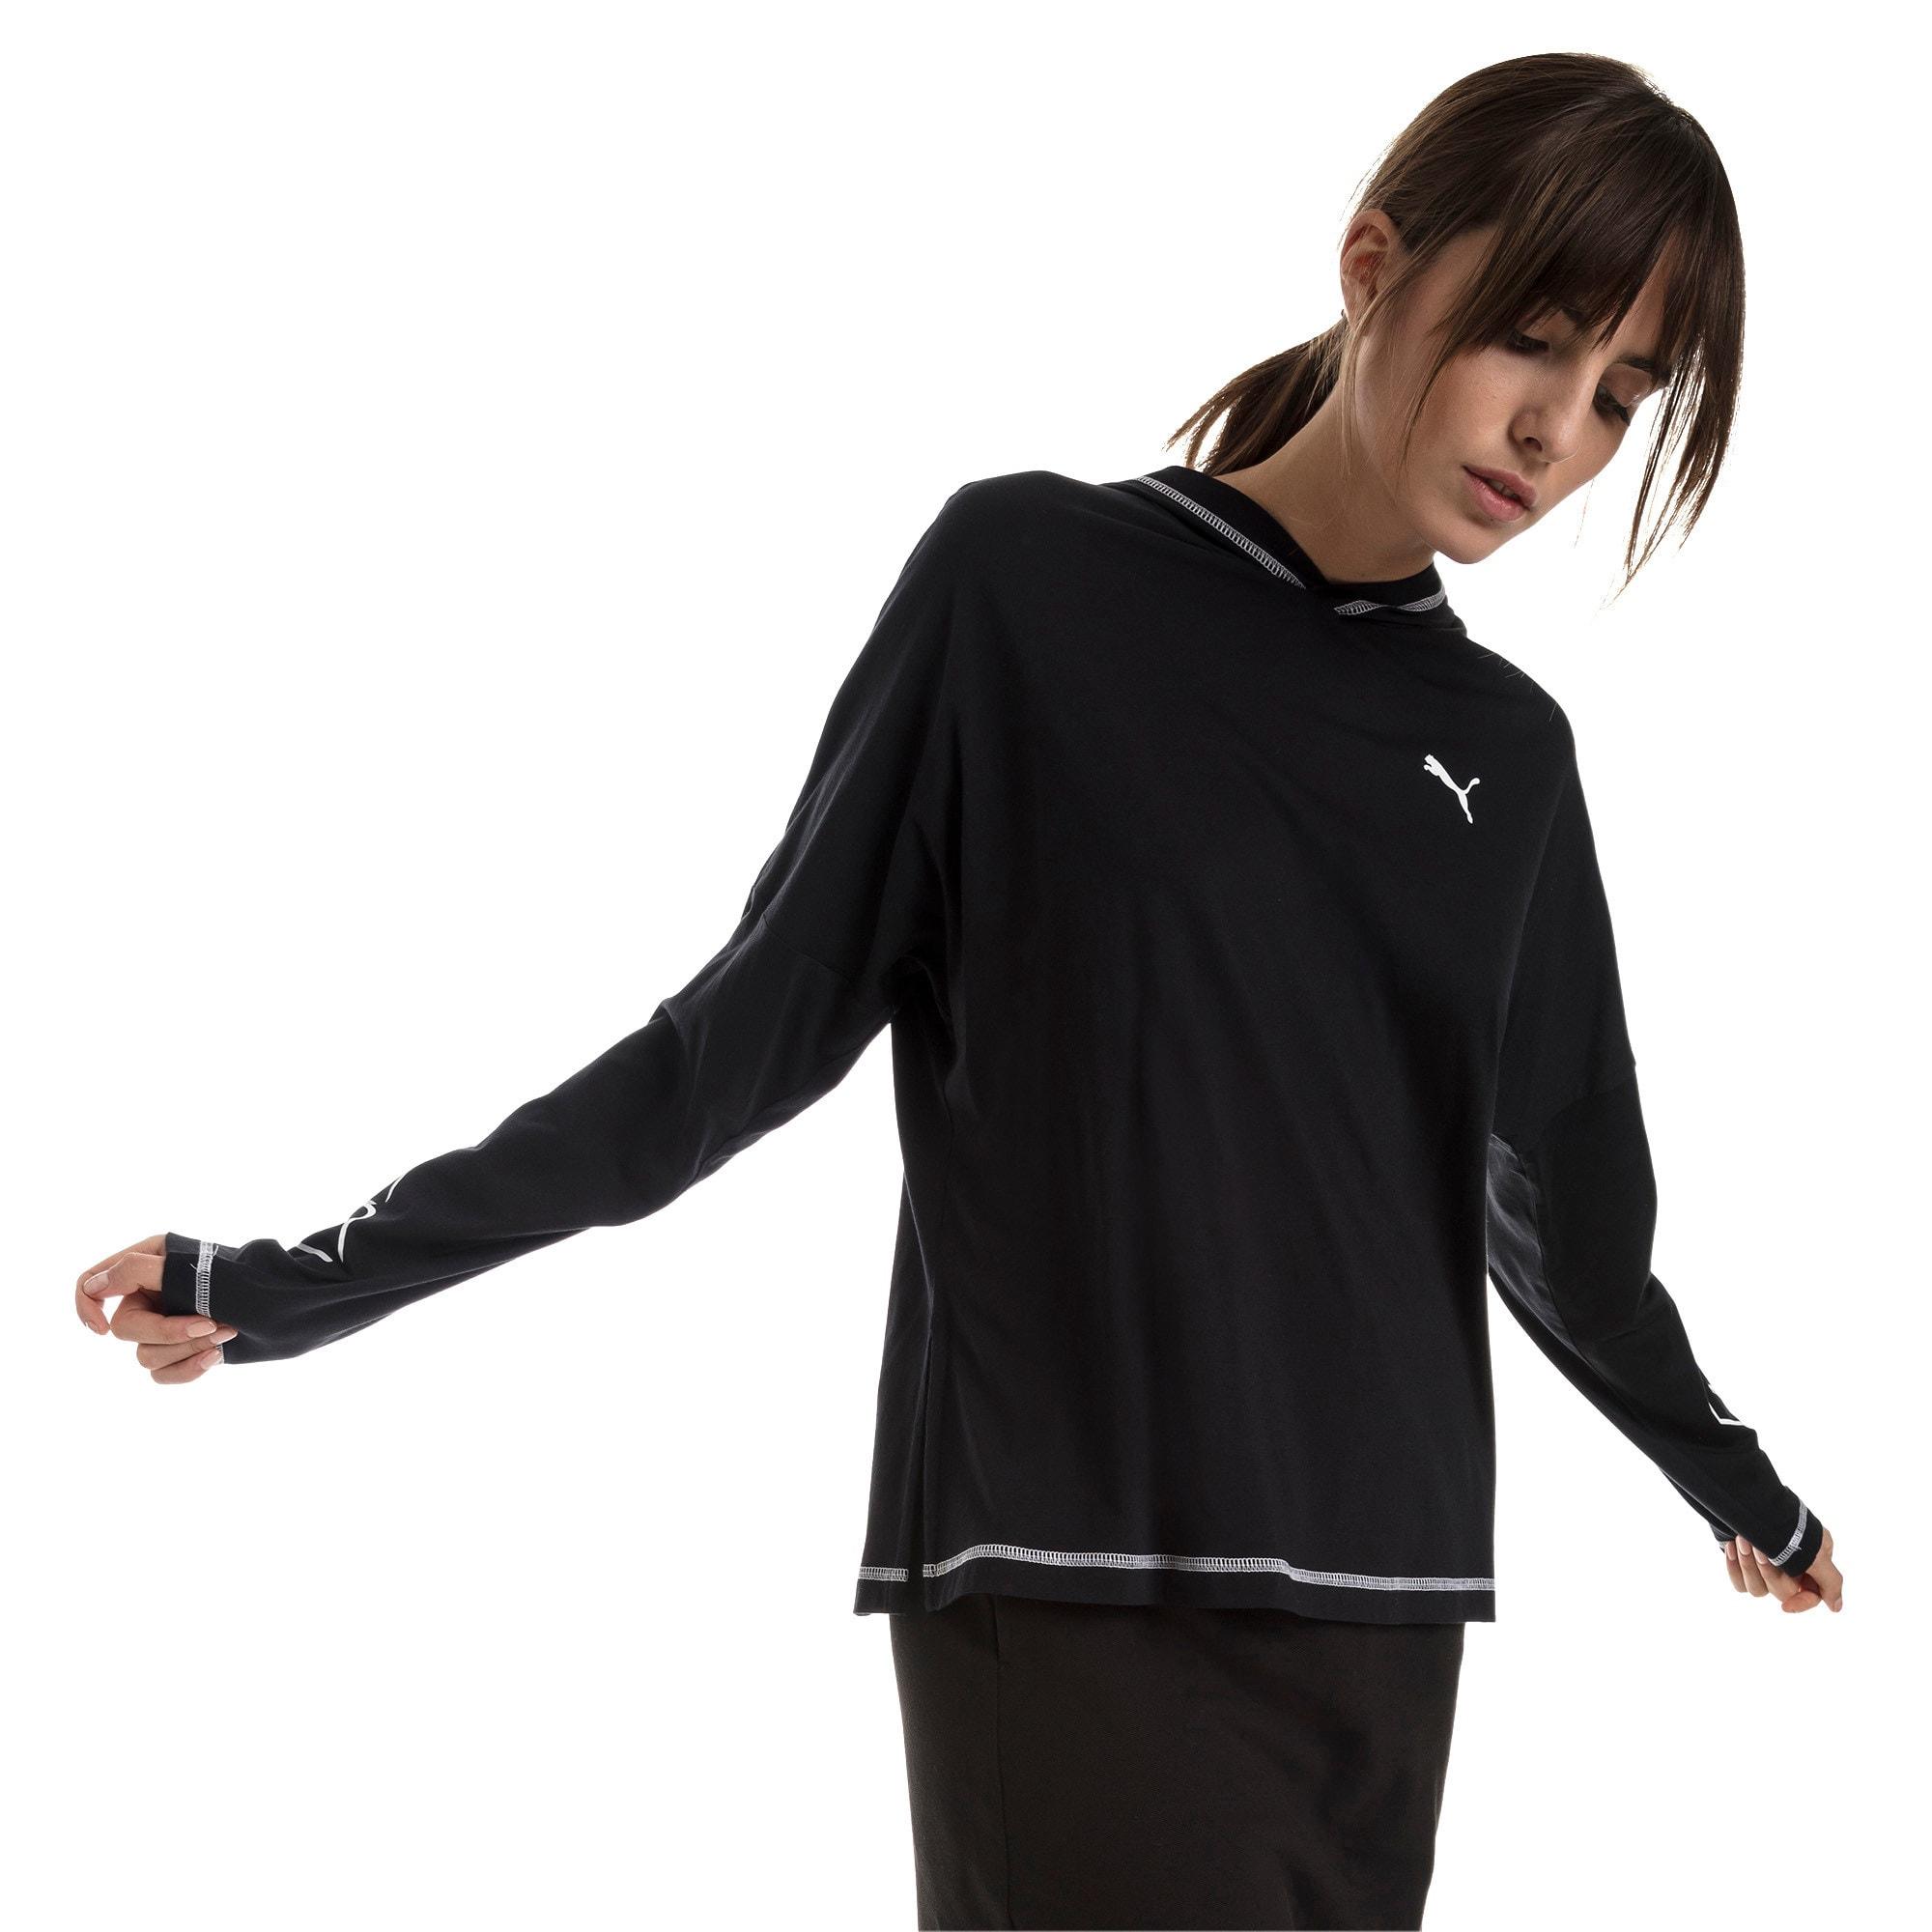 Miniatura 1 de Top liviano Modern Sports para mujer, Cotton Black, mediano